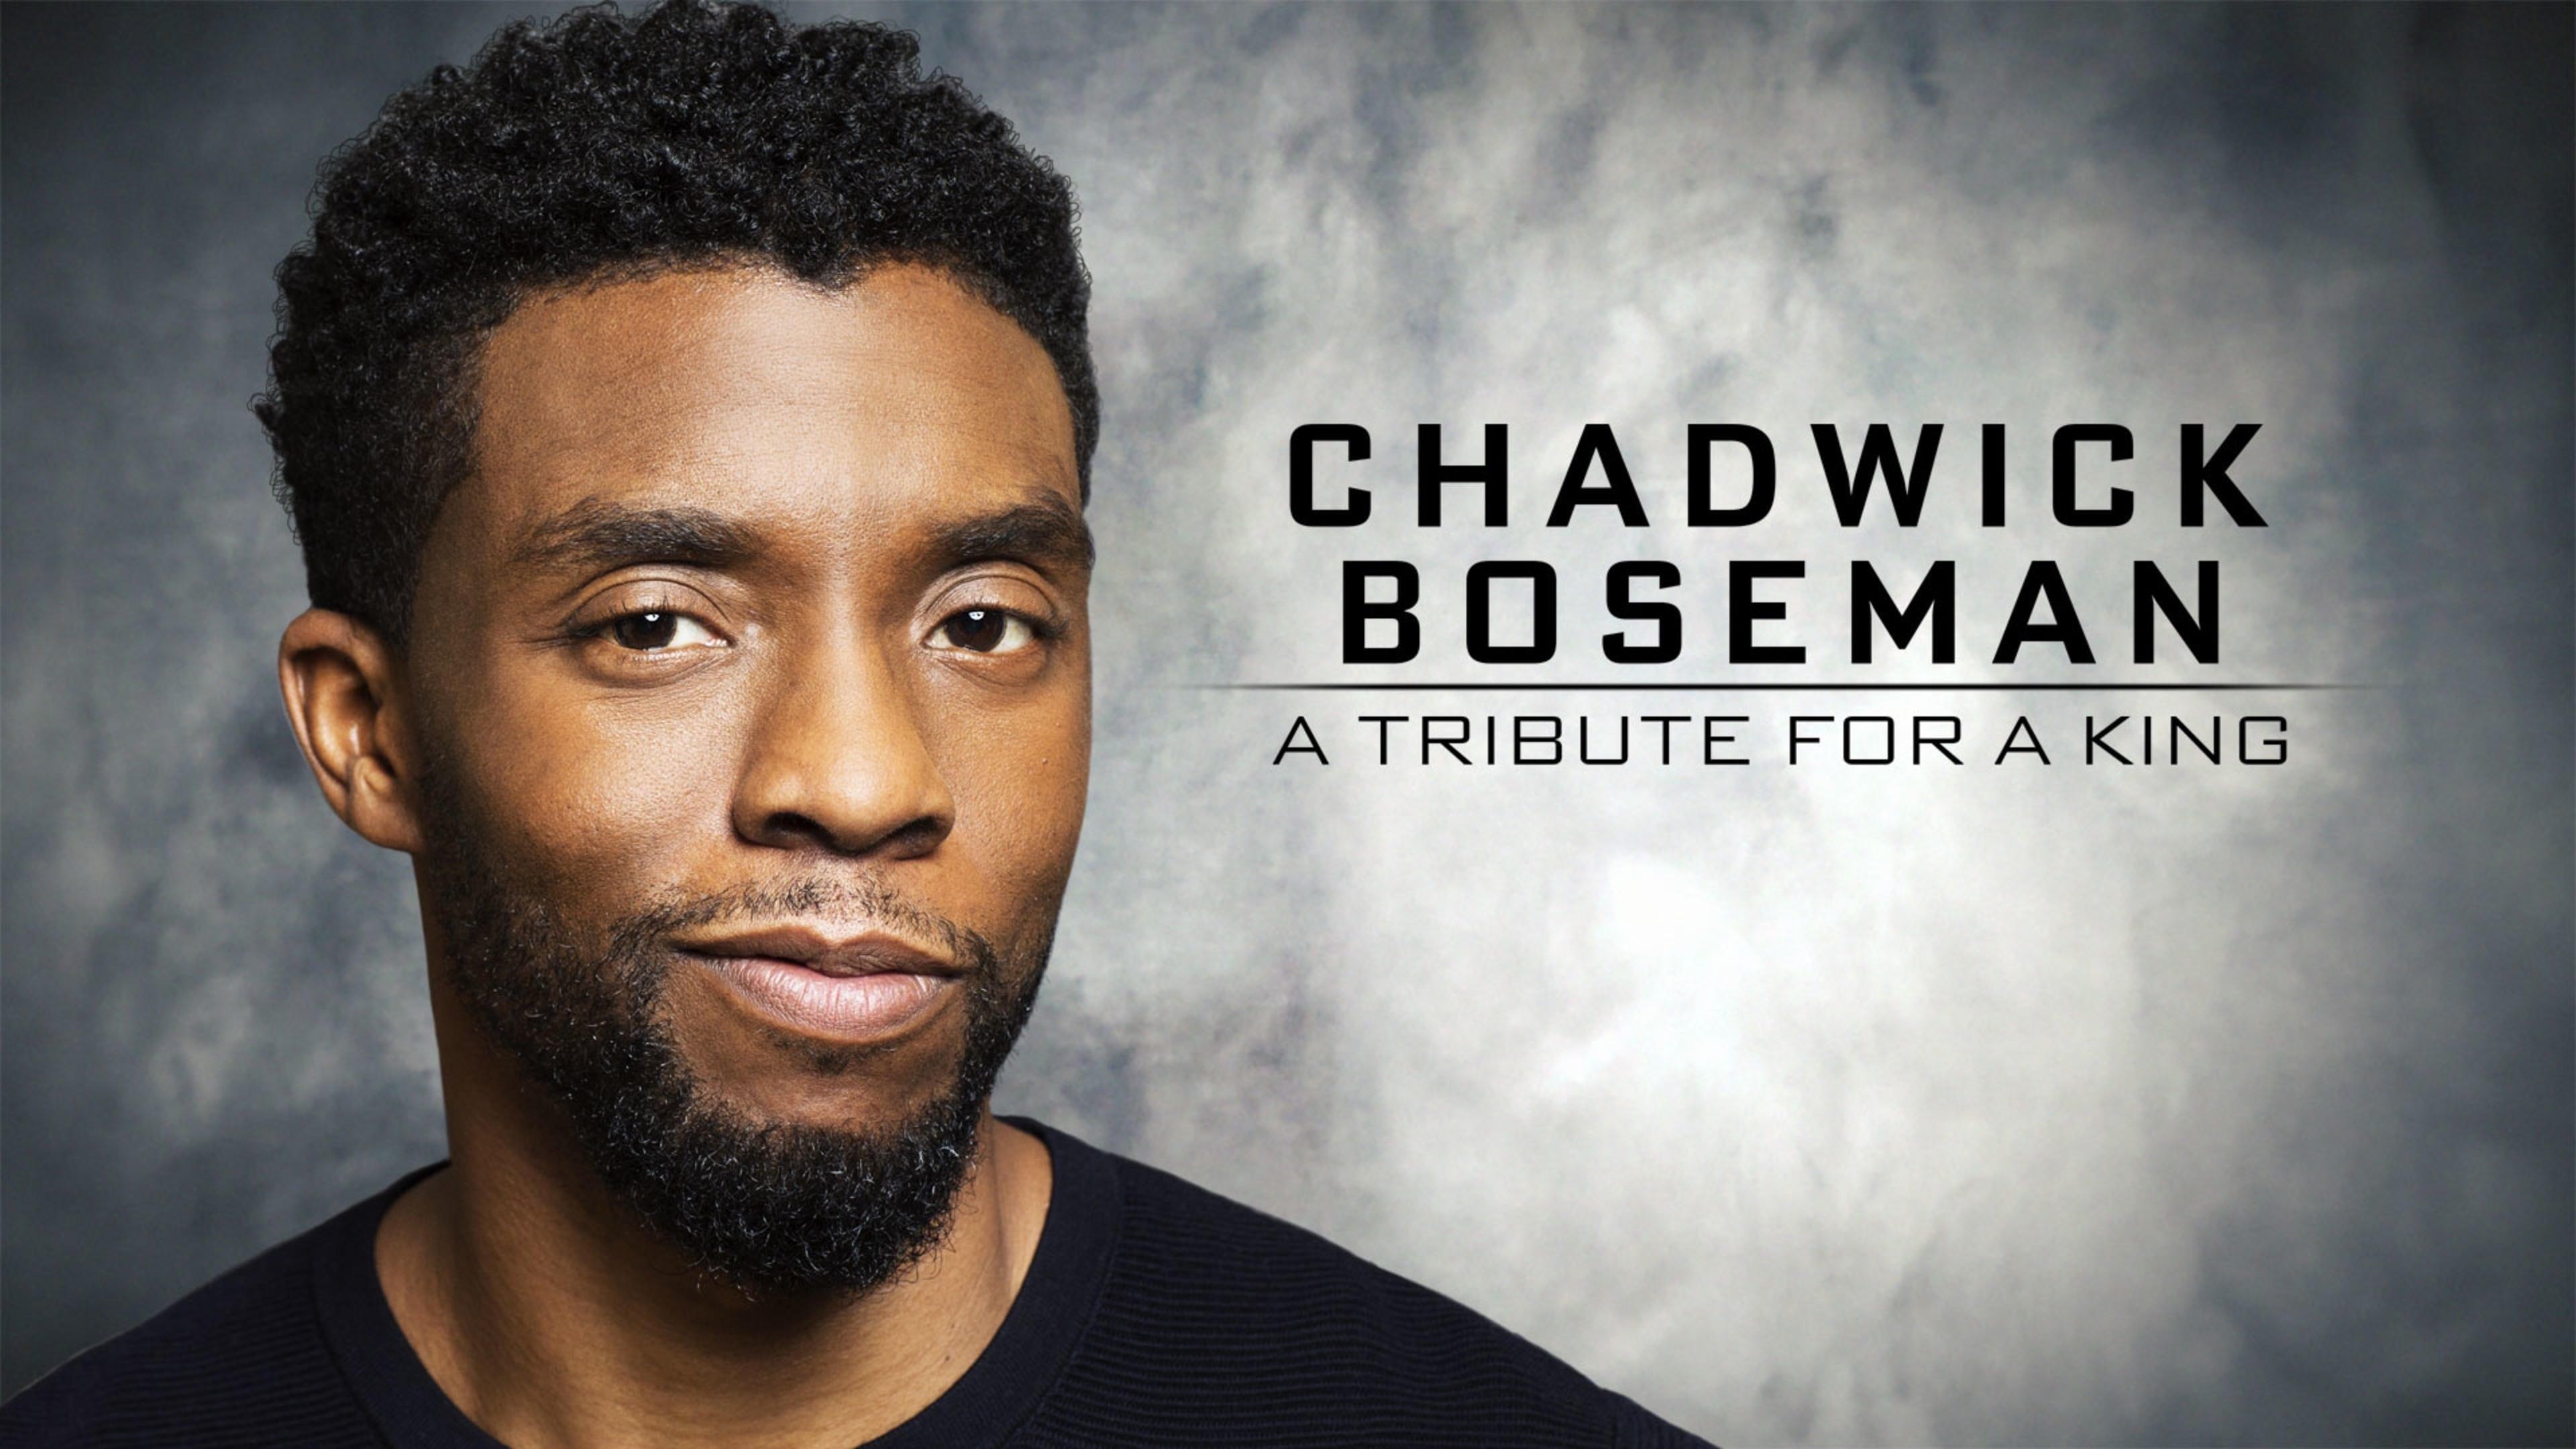 2020 Chadwick Boseman – A Tribute for a King